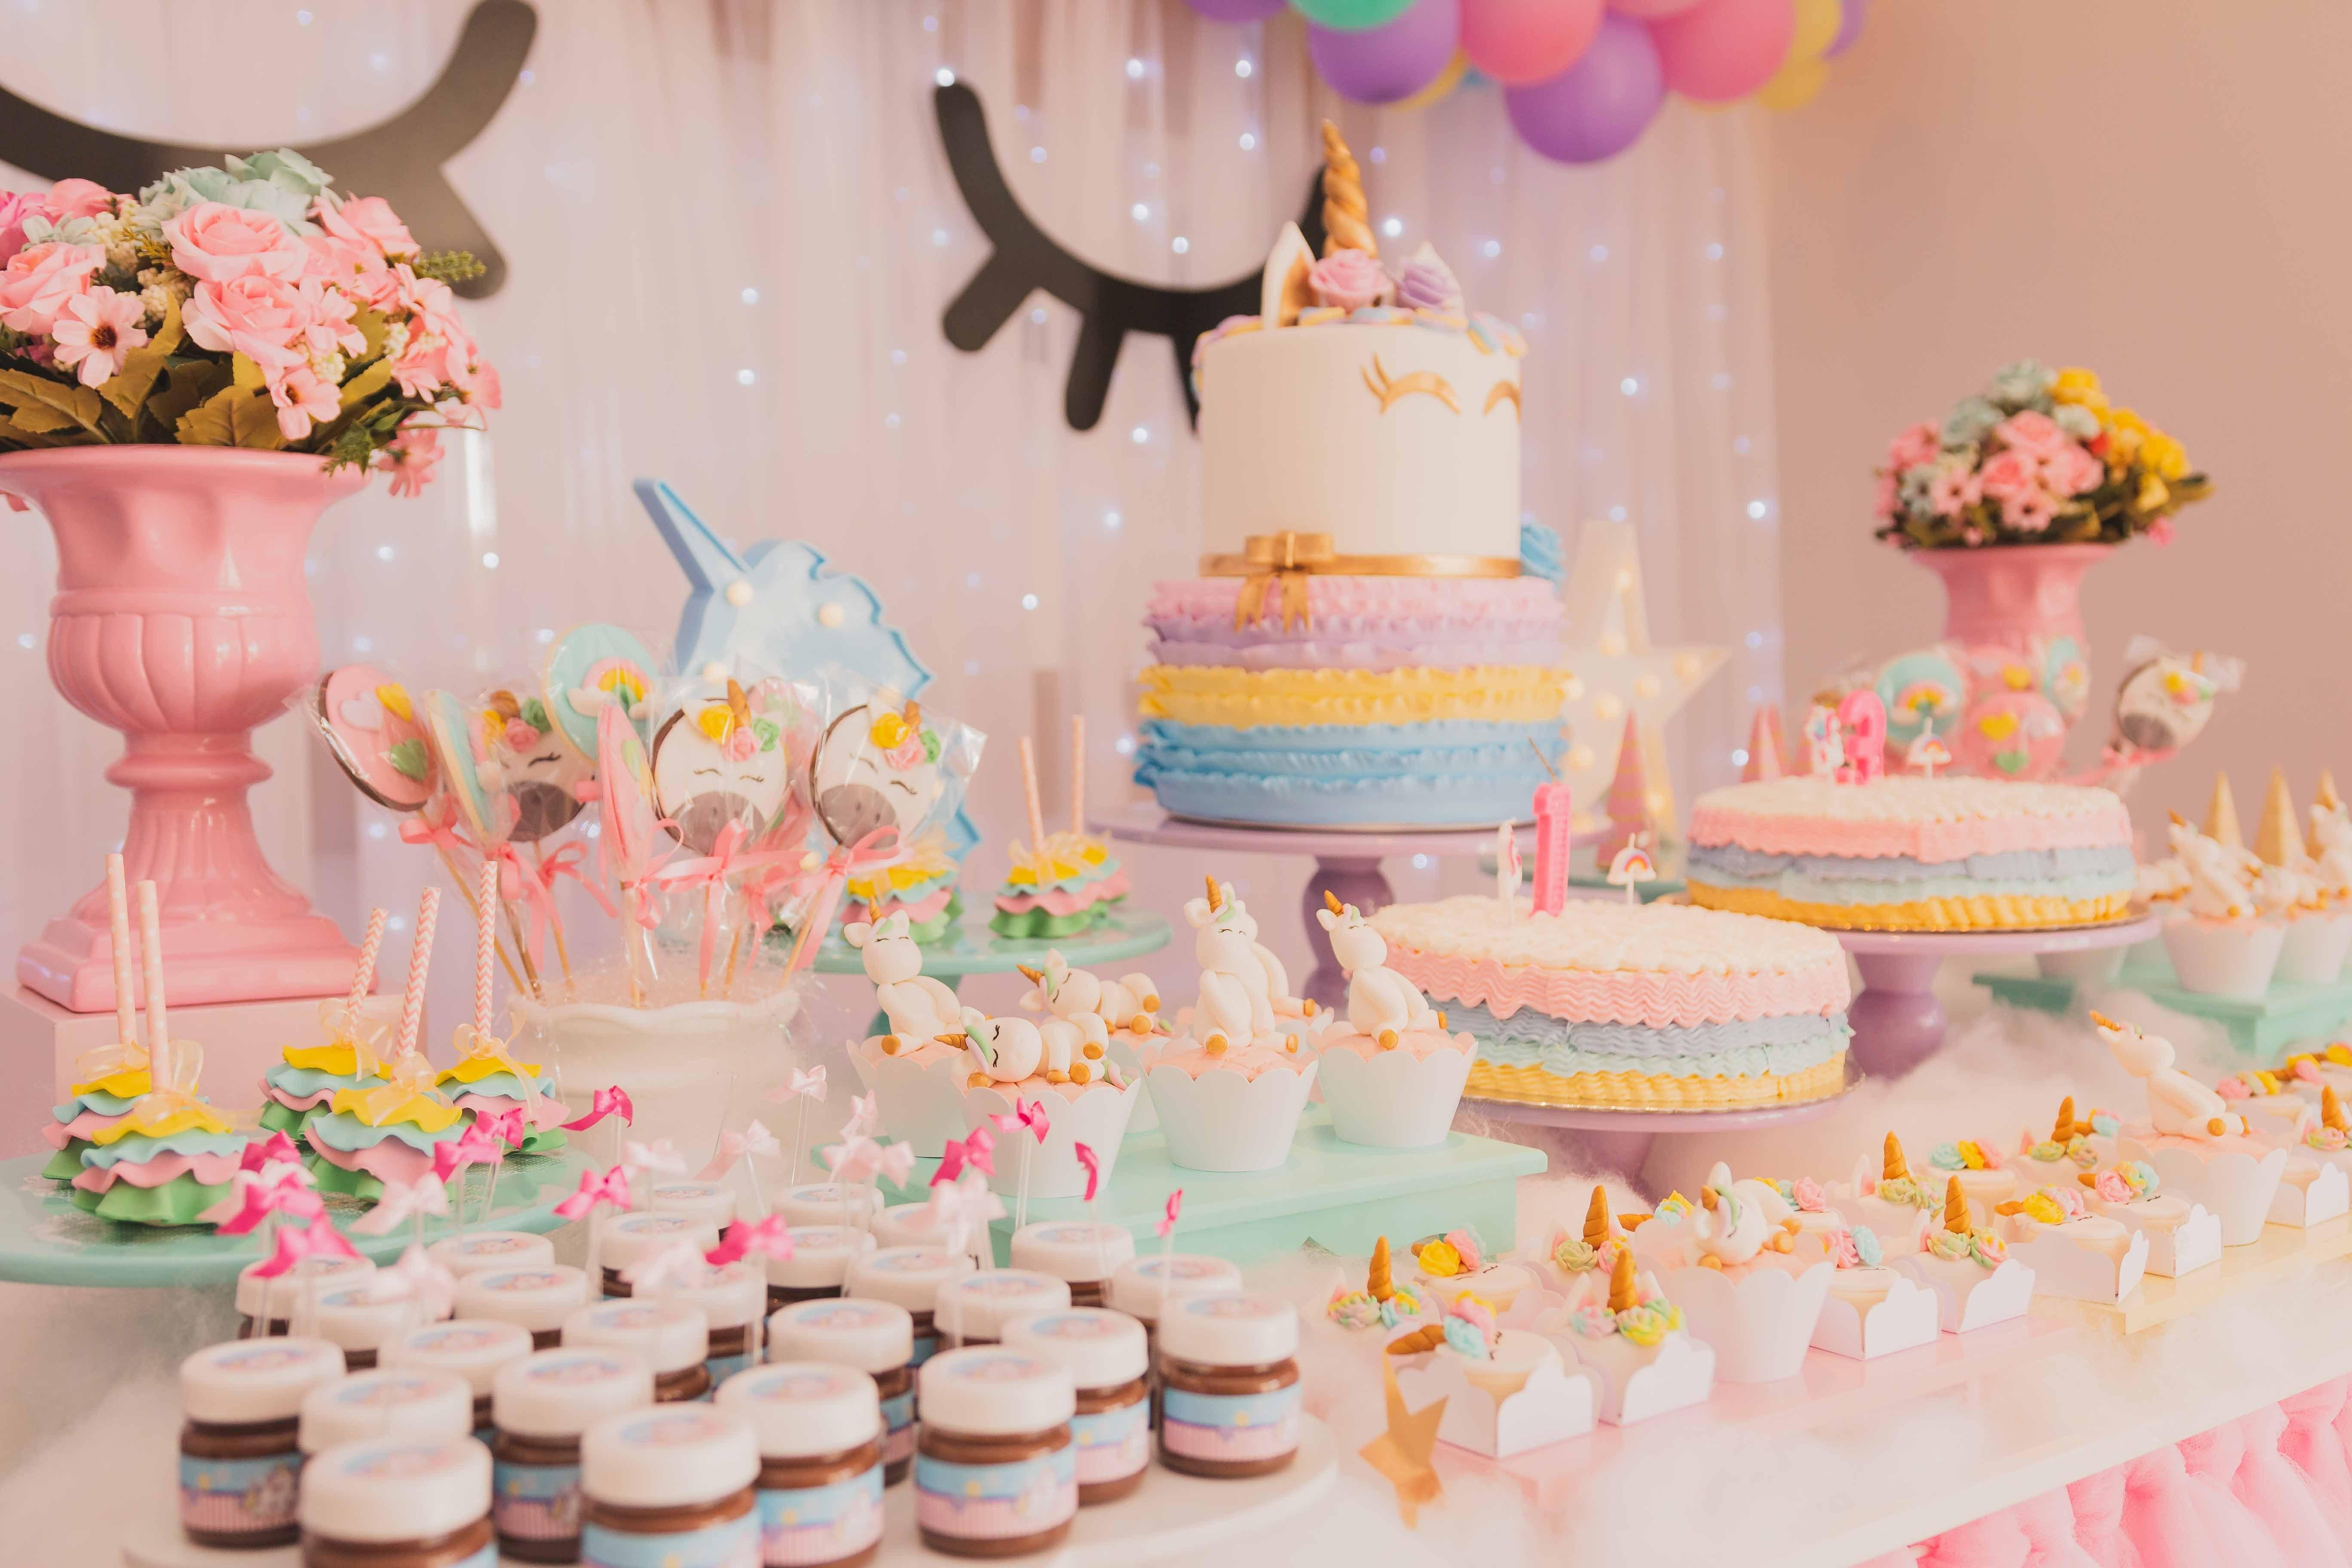 500  amazing birthday cake photos  u00b7 pexels  u00b7 free stock photos